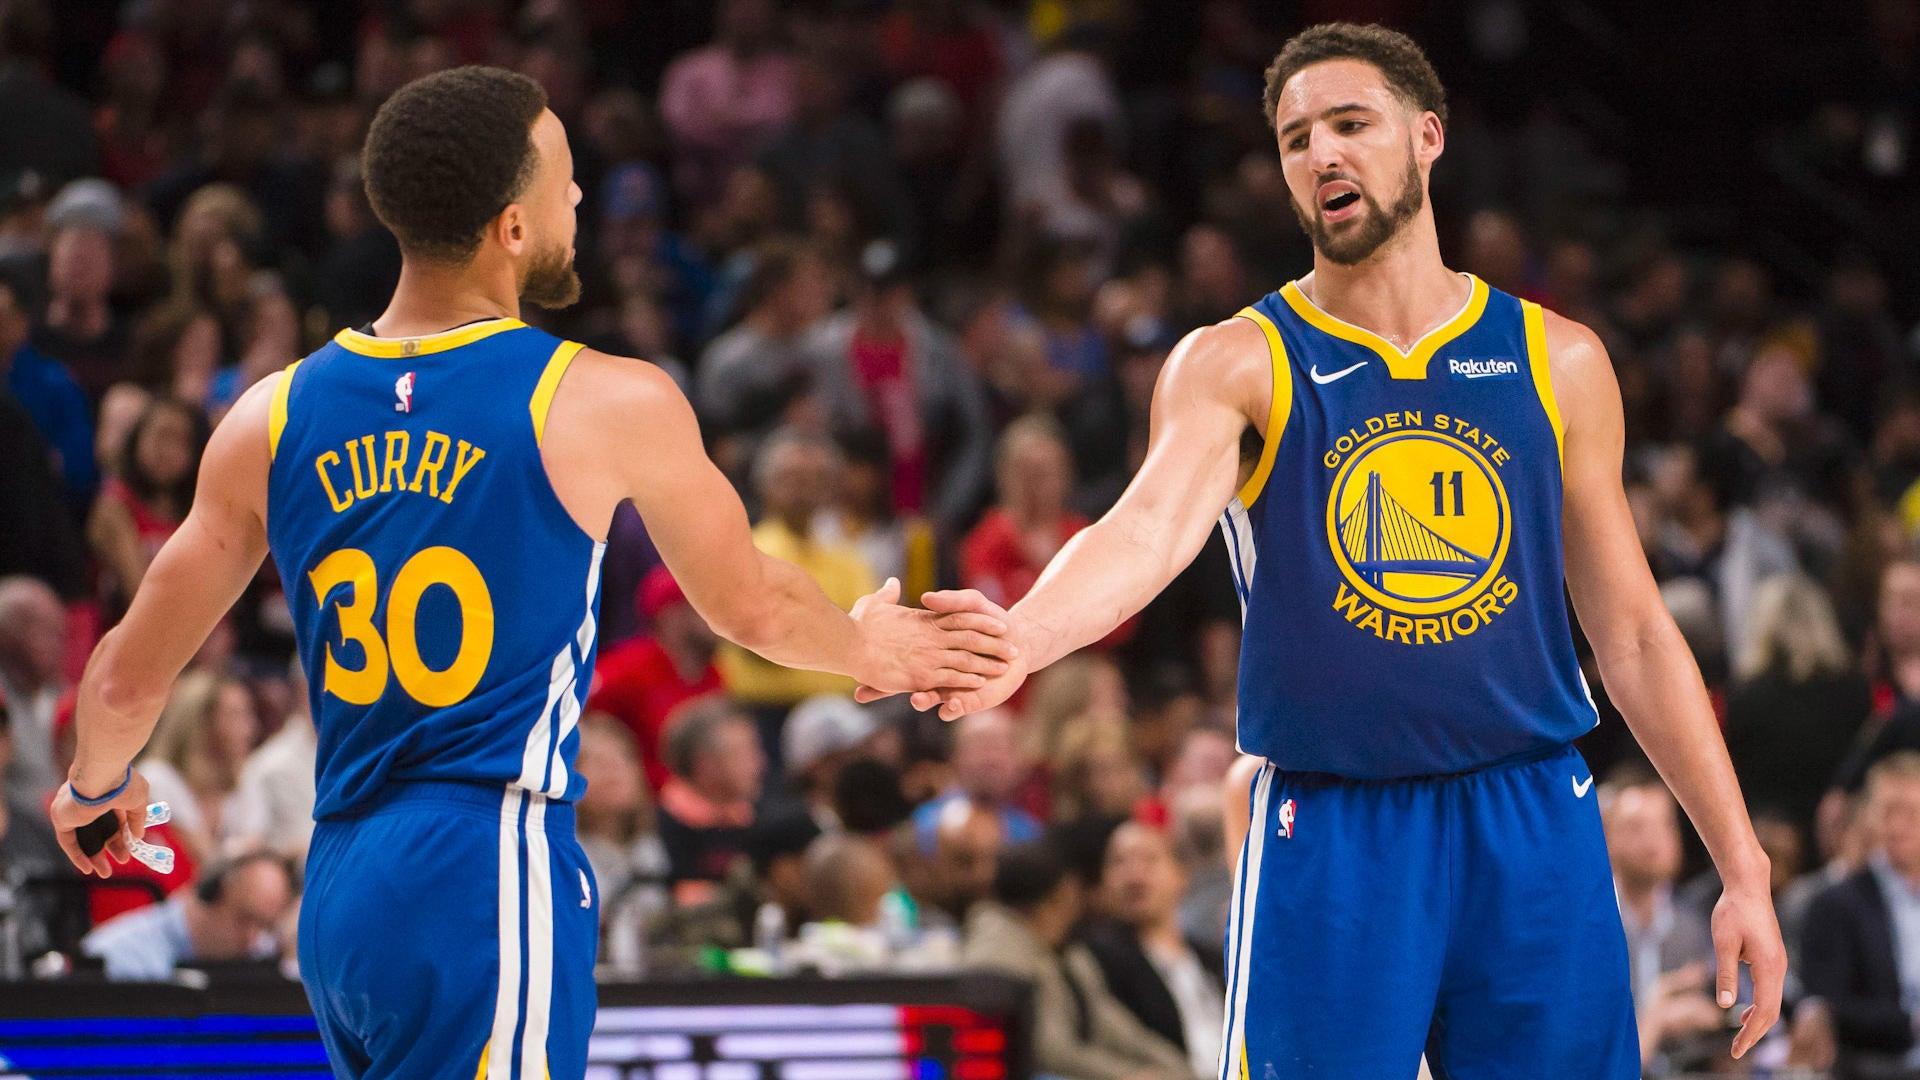 NBA DFS: Draymond Green and top picks for Warriors vs. Blazers, Game 4 FanDuel, DraftKings daily fantasy basketball lineups